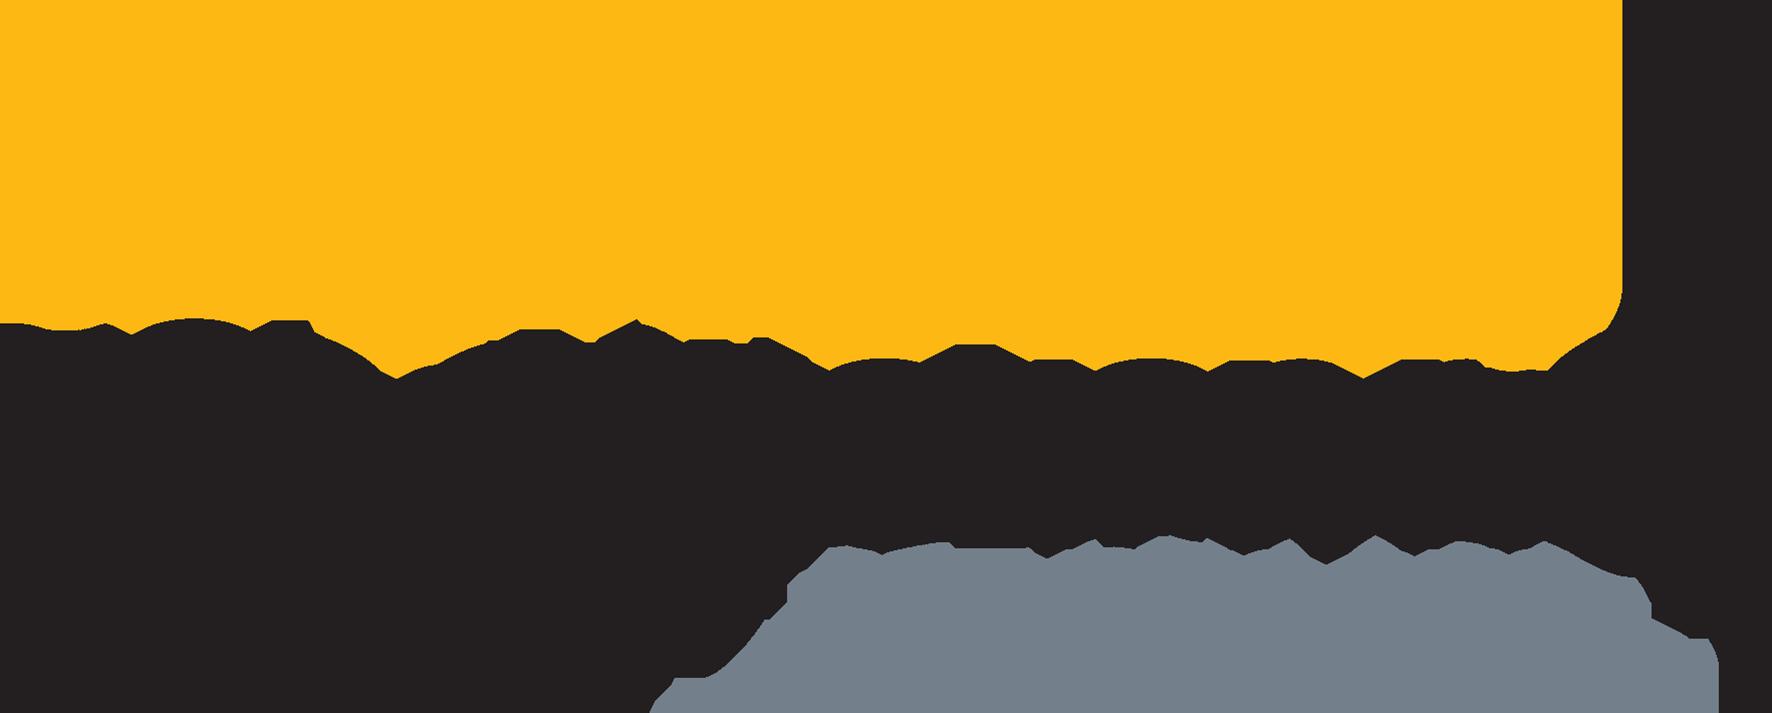 Construction Risk Partners